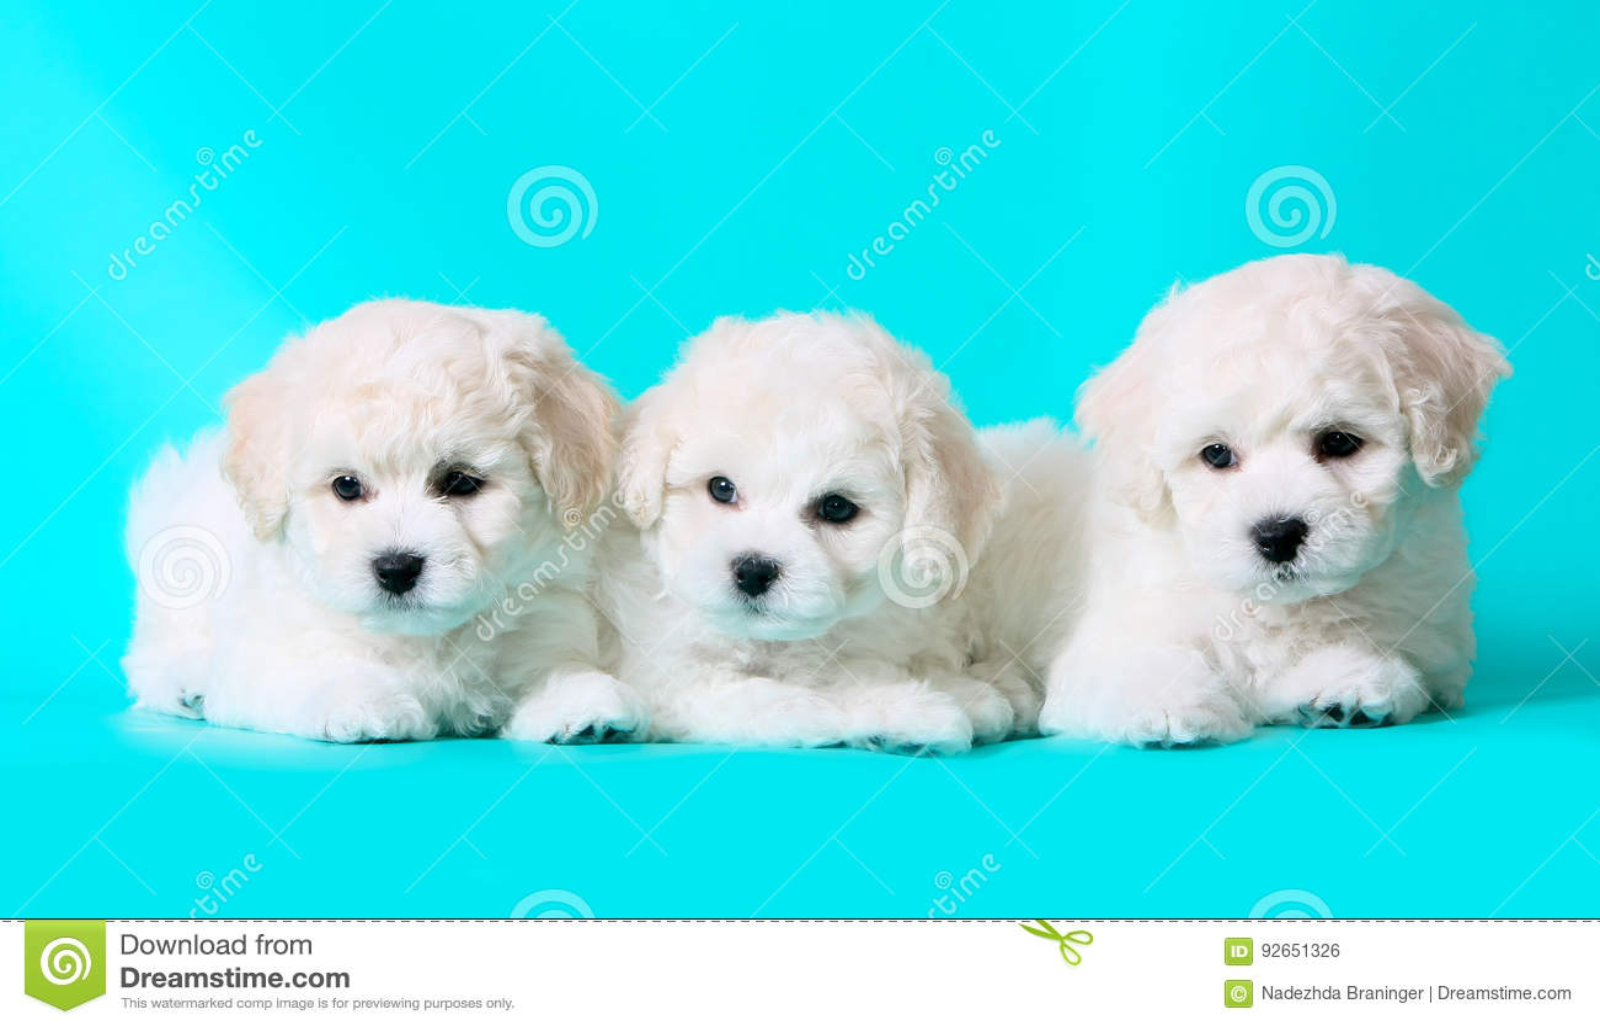 Three Cute Puppies White Breed Bichon Frize Puppies Stock Photo